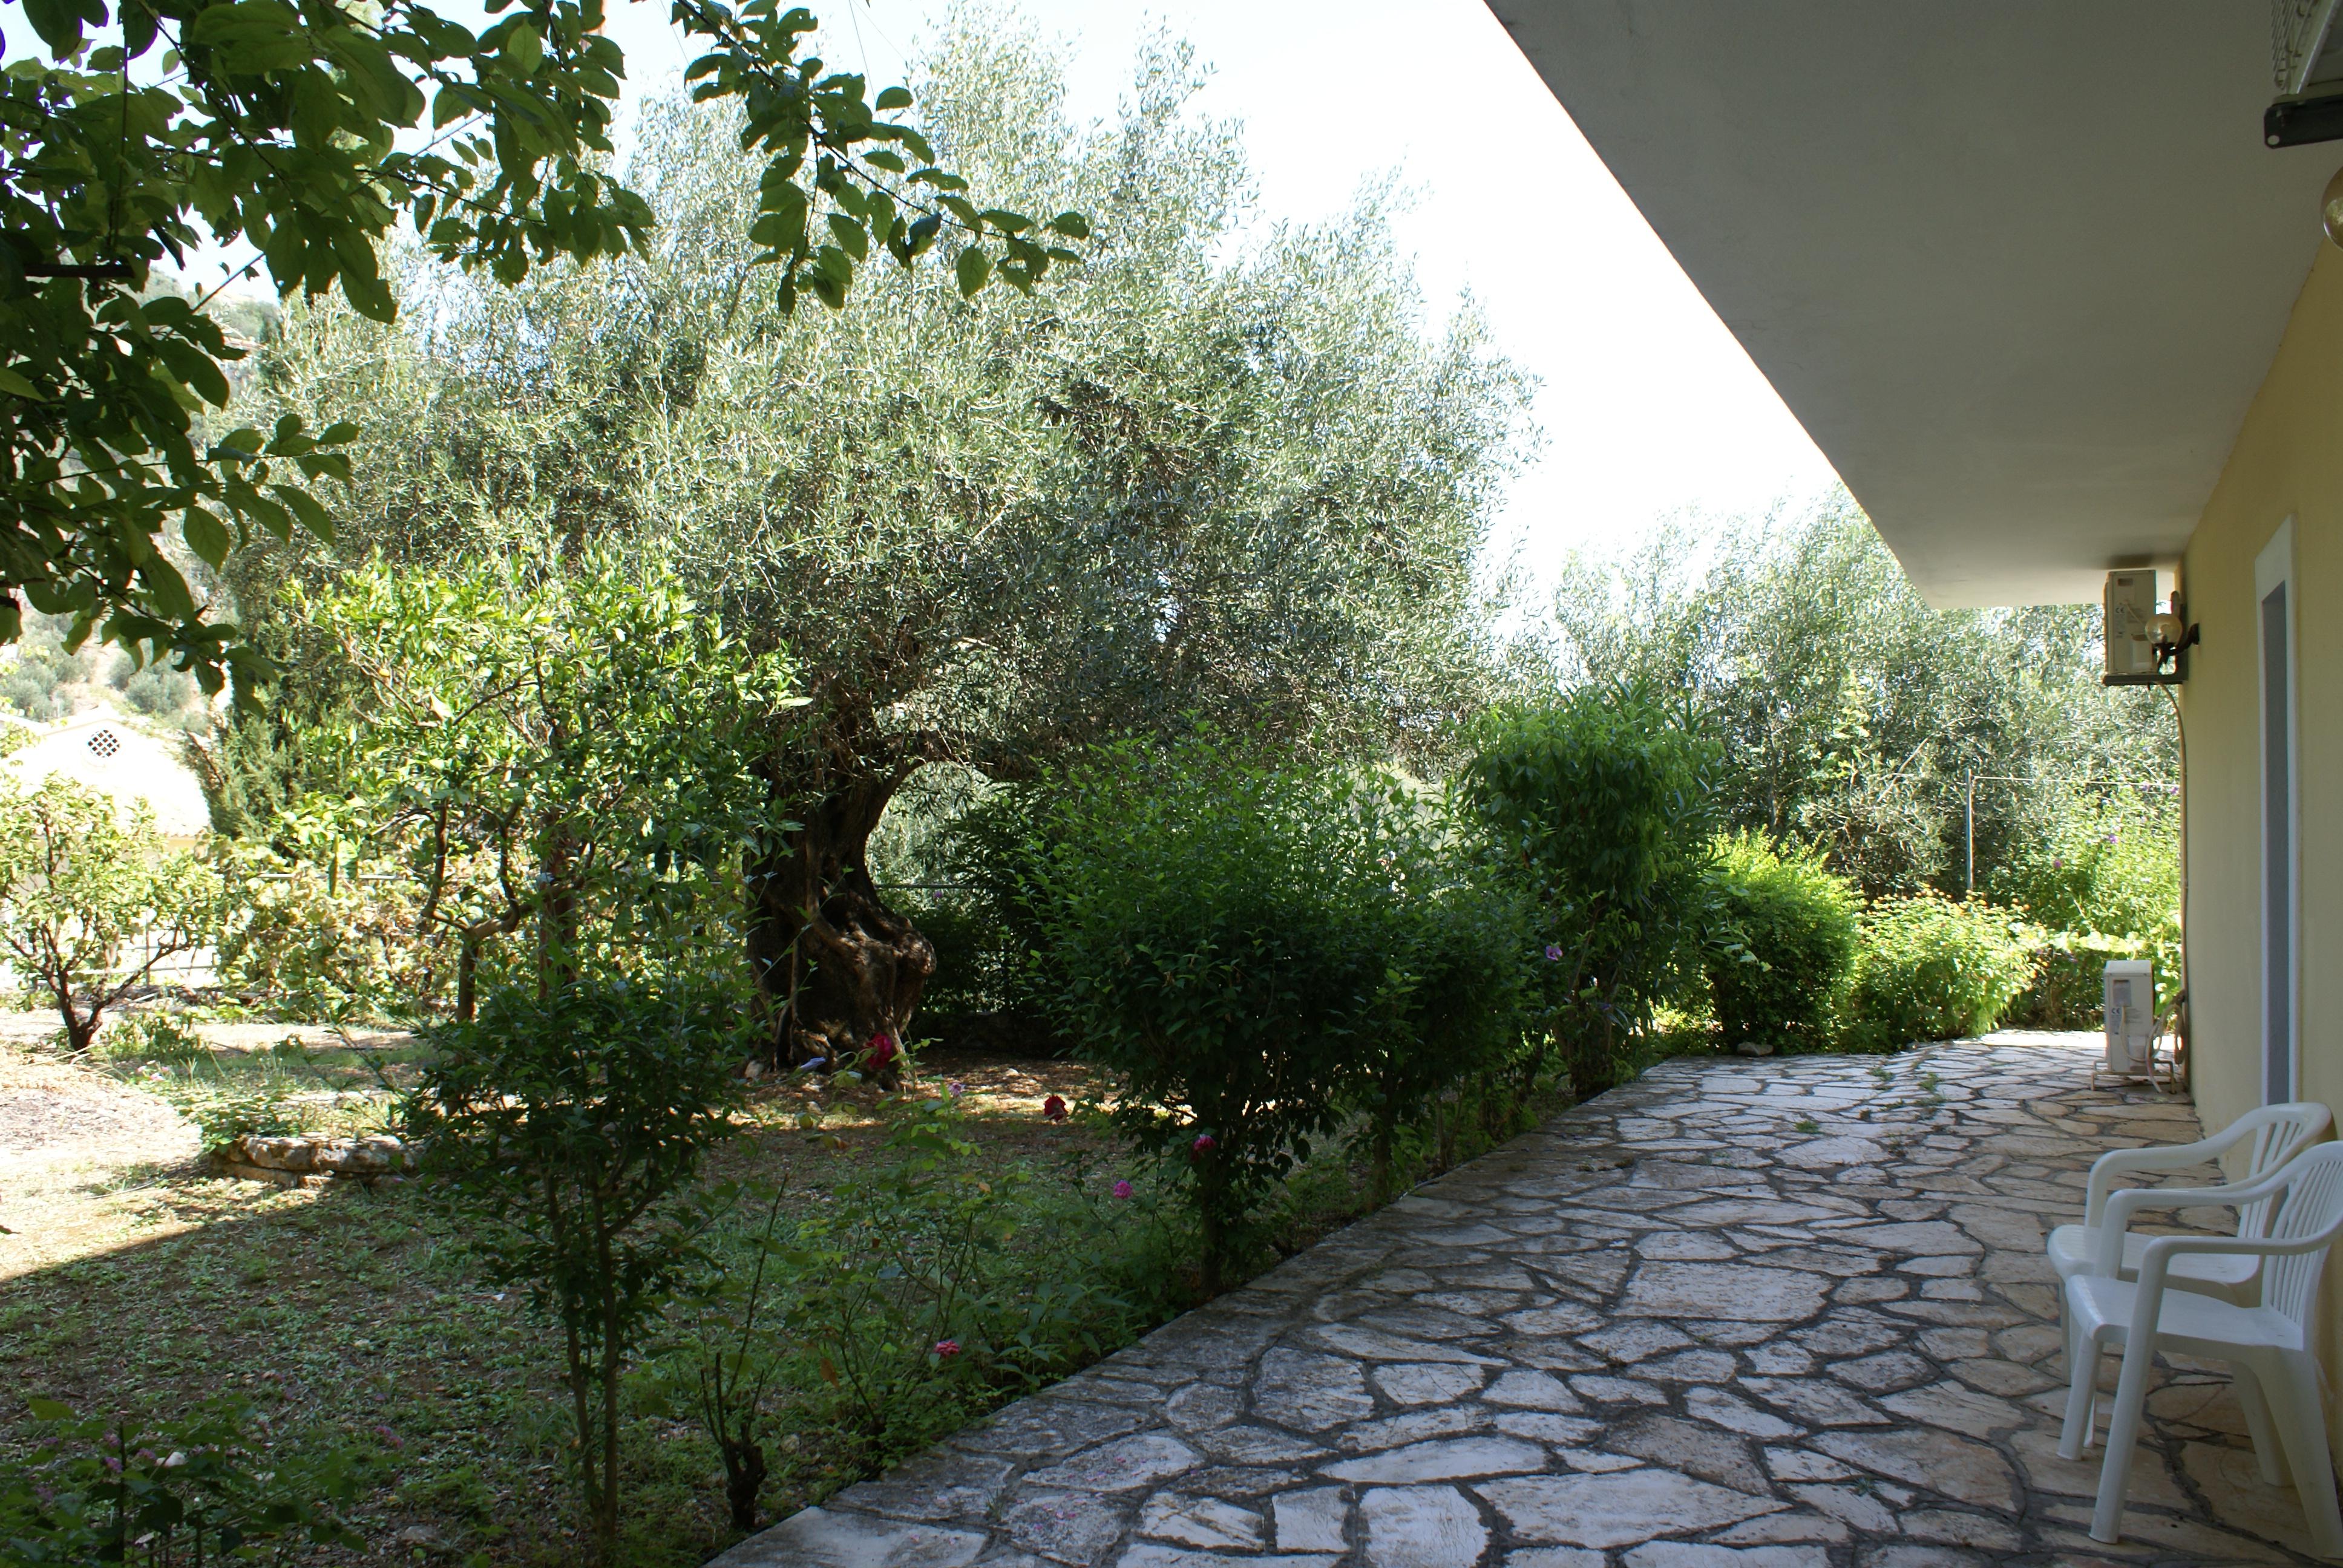 Garten - Balkon - Korfu Ferienhaus Villa Adonis mit Pool, Nissaki, KorfuCorfu.de